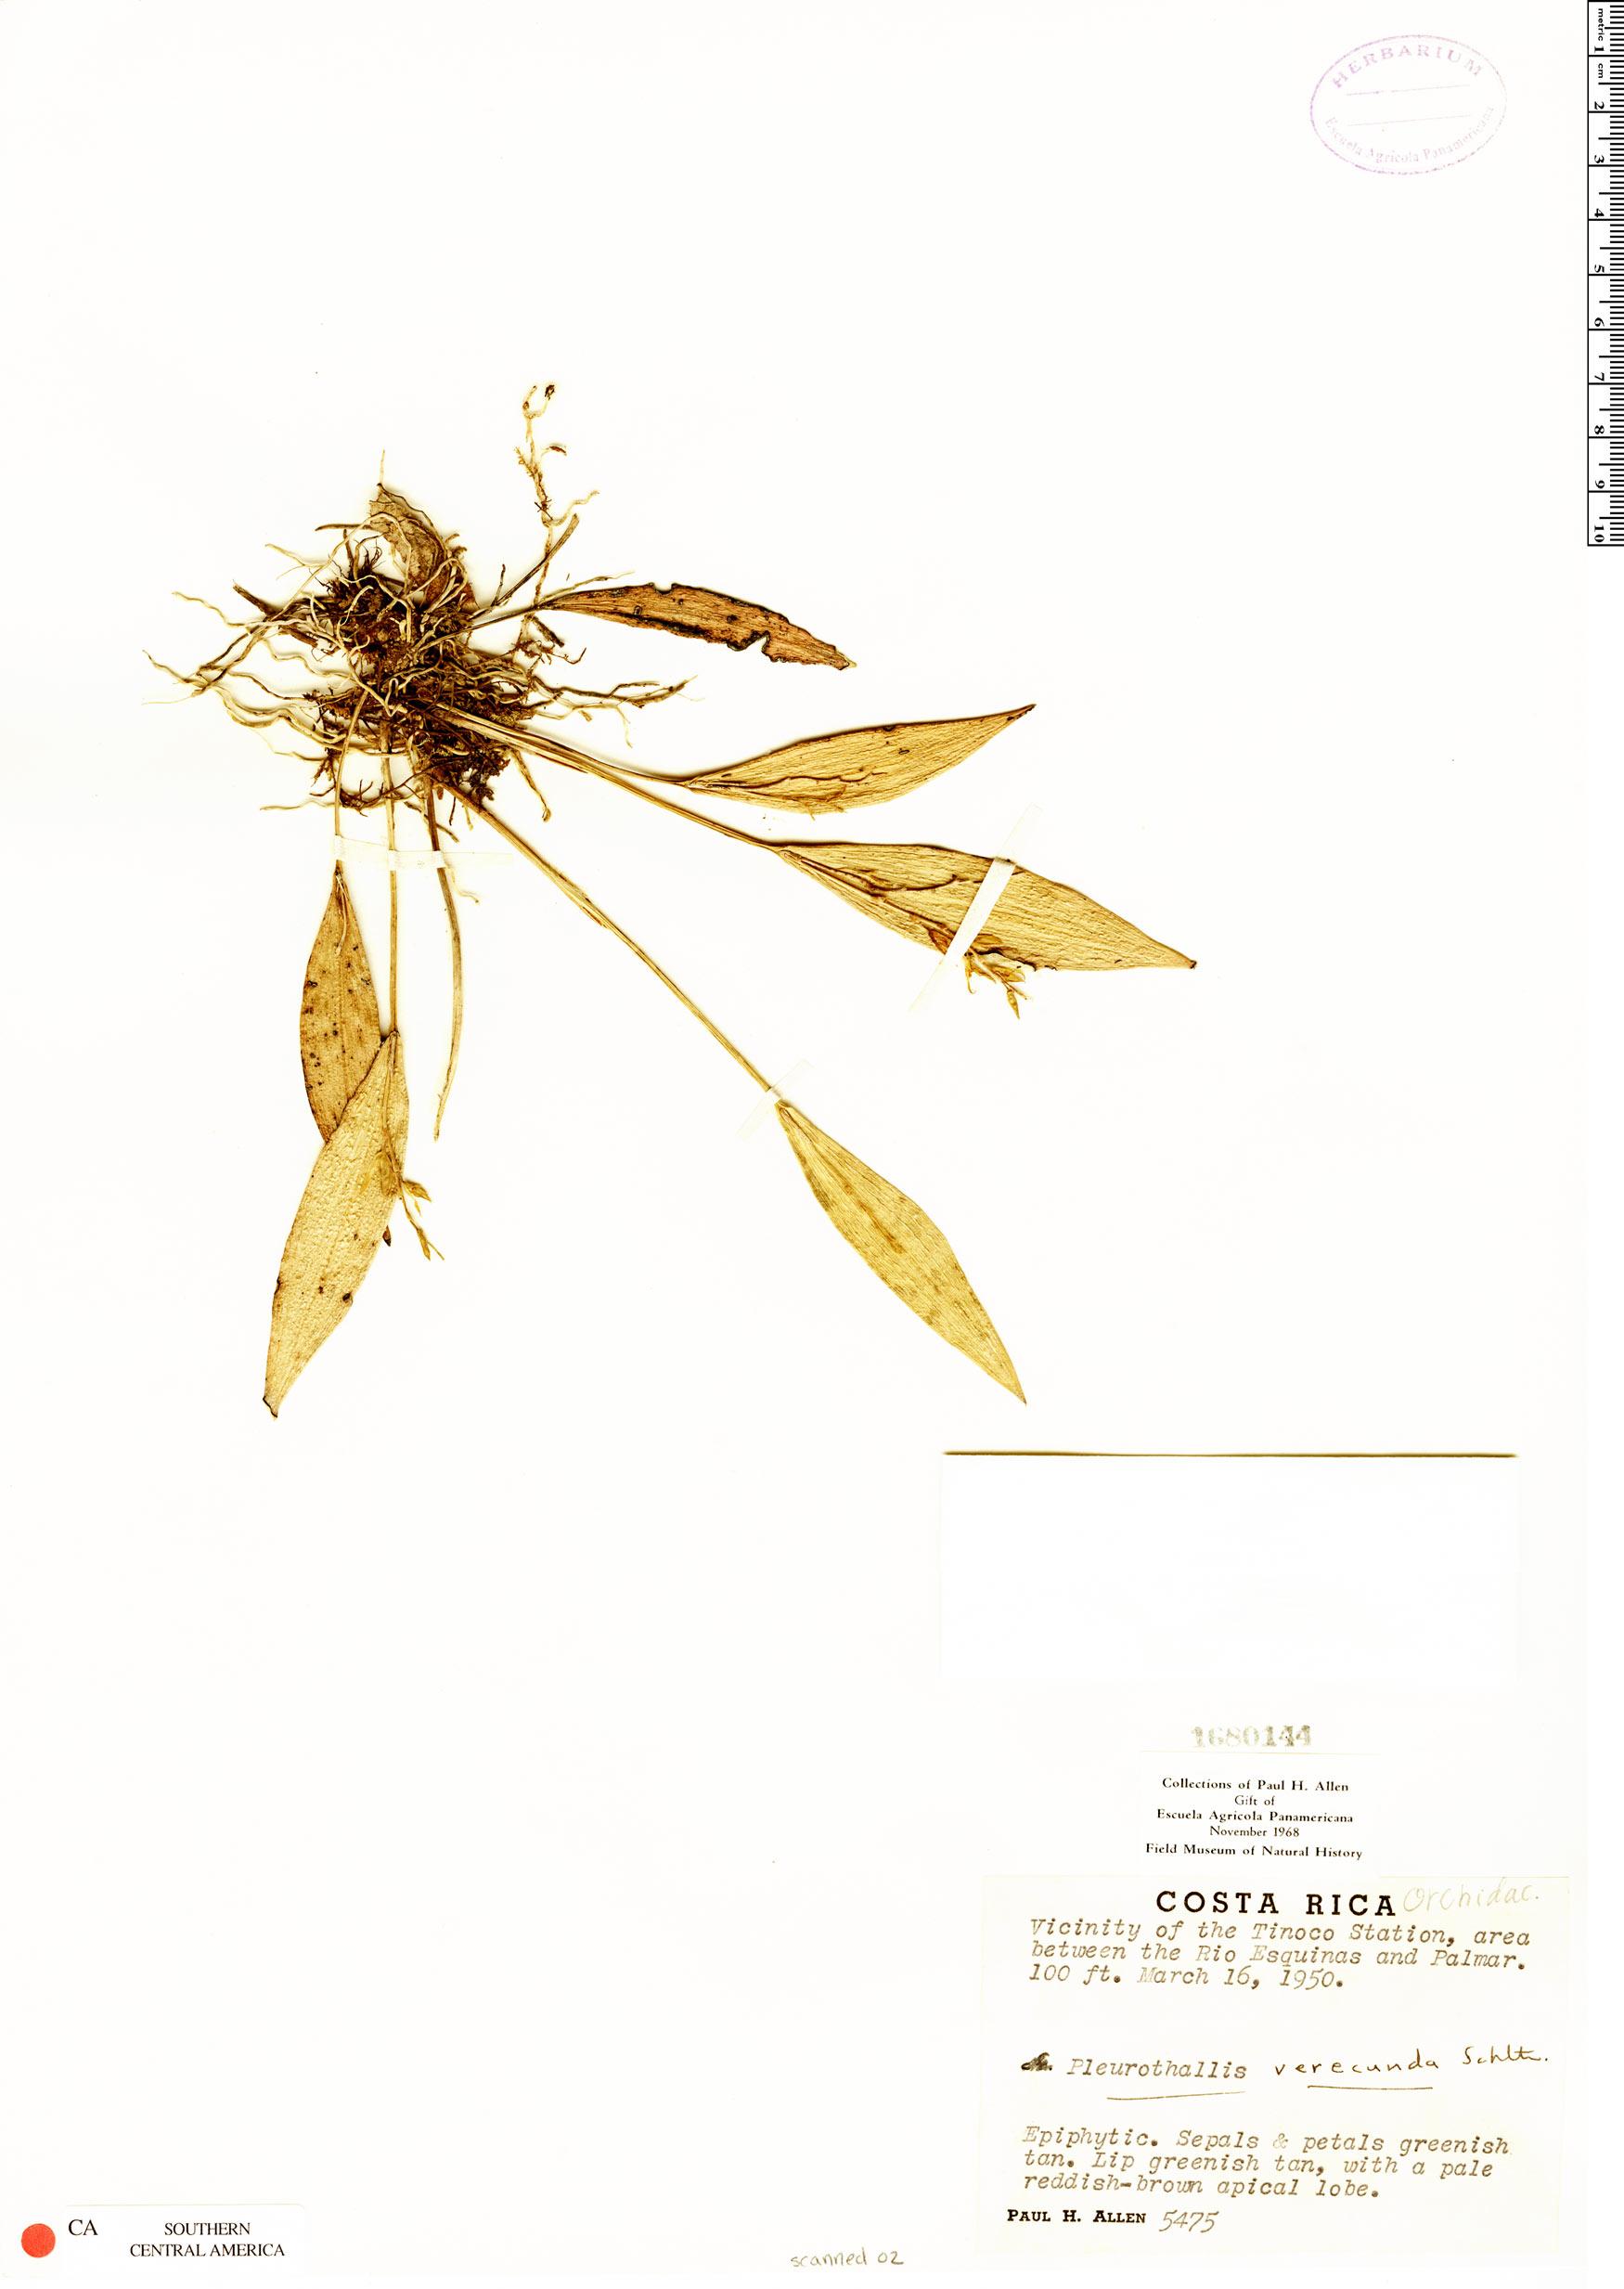 Specimen: Pleurothallis verecunda